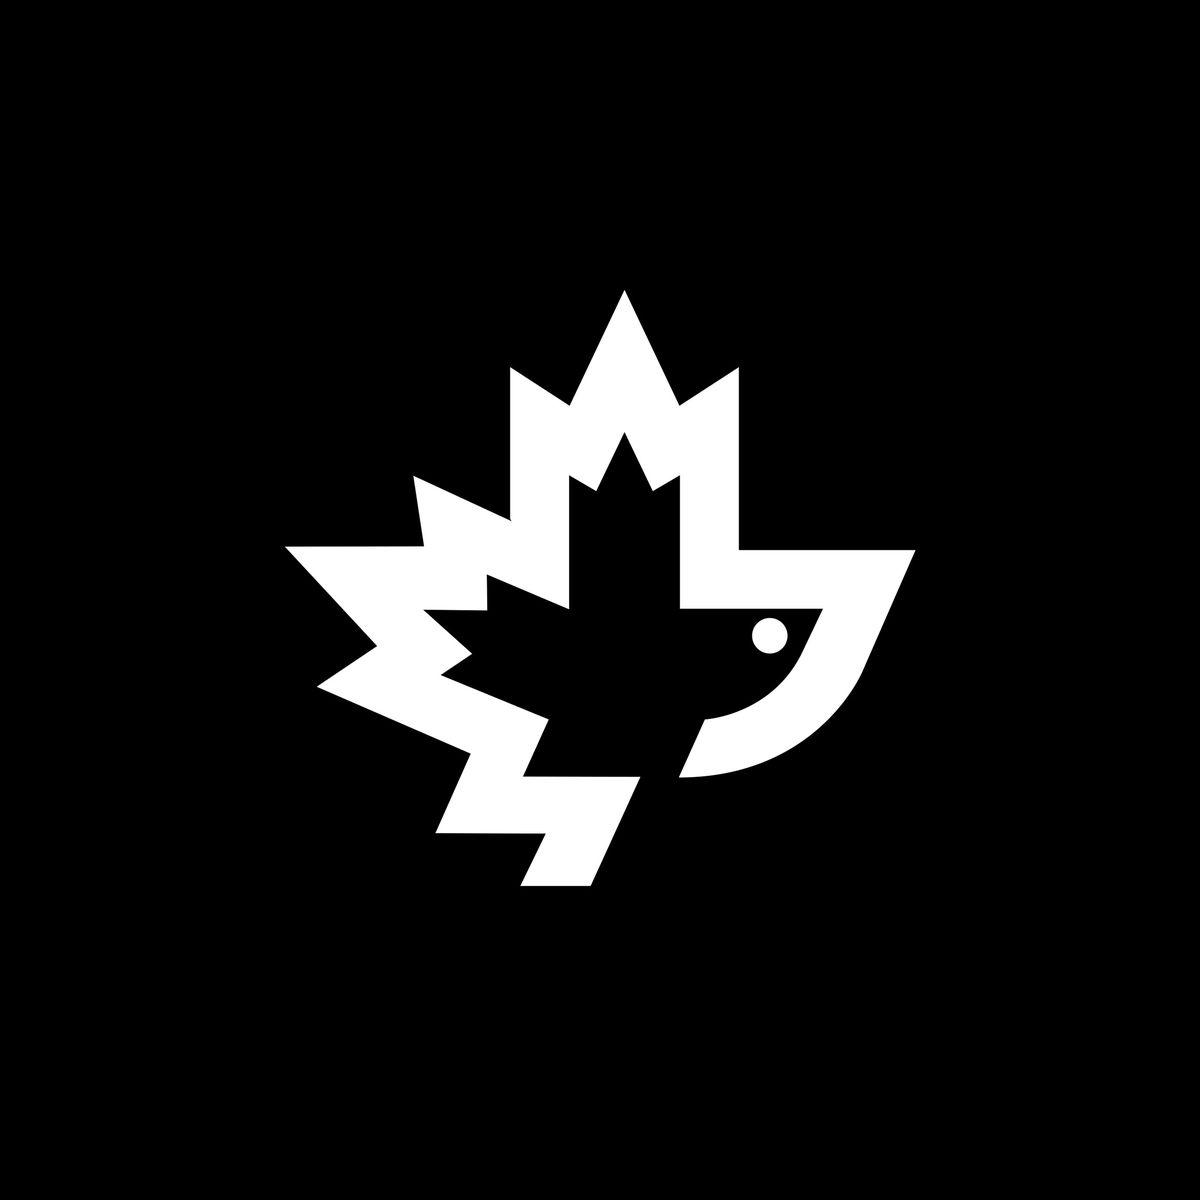 Logo of maple leaf flower